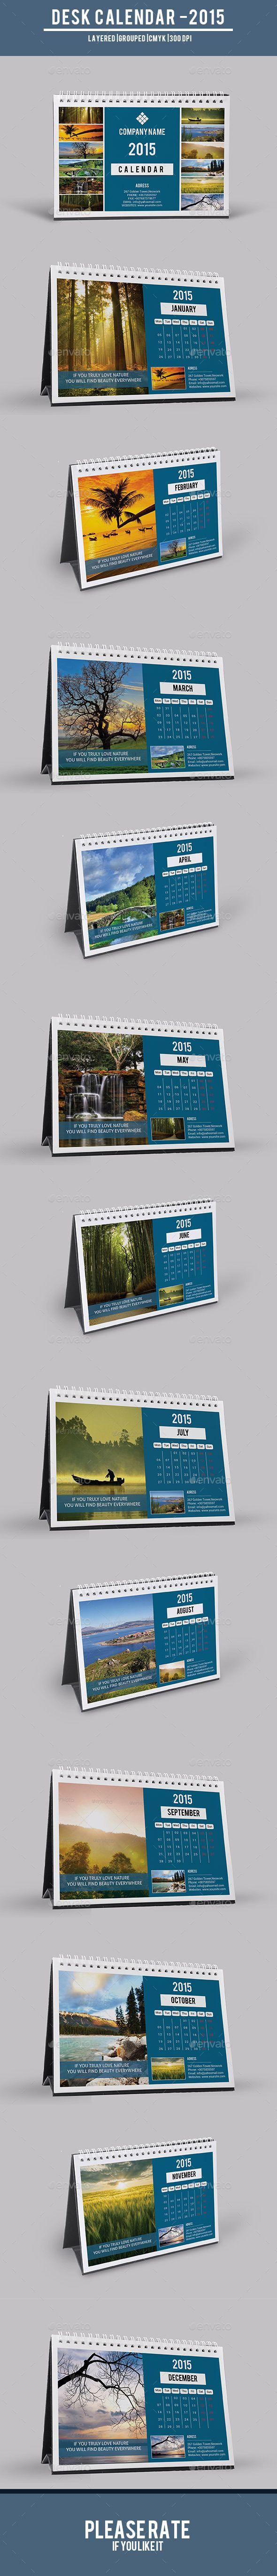 Desk Calendar Template | Buy and Download: http://graphicriver.net/item/desk-calendarv06/9571377?ref=ksioks